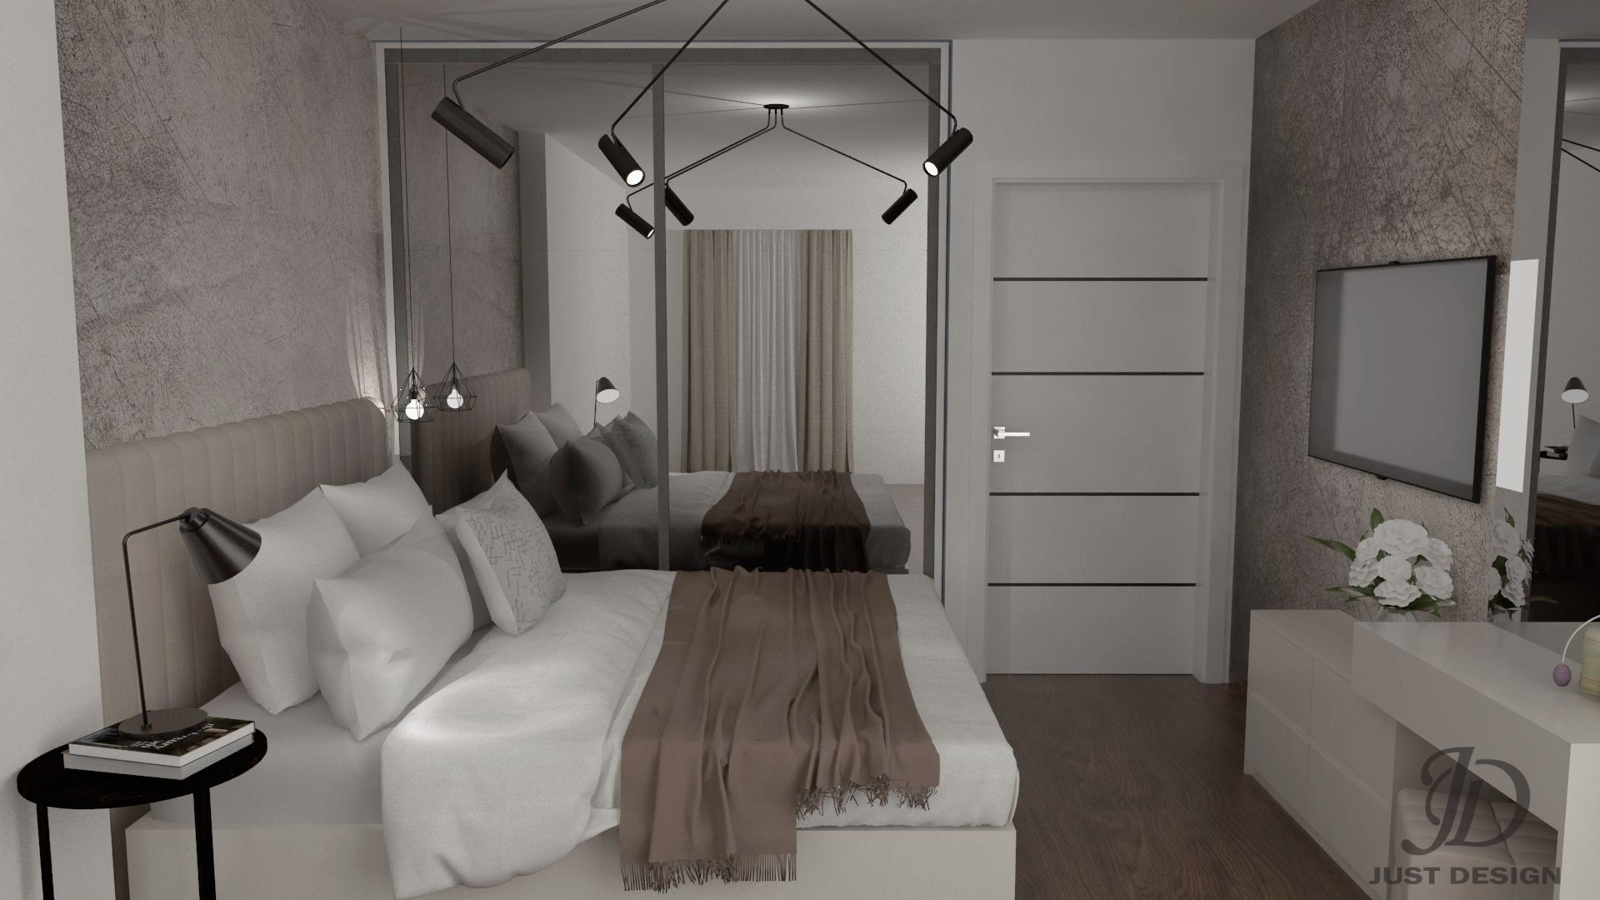 ureduvanje na spalna soba